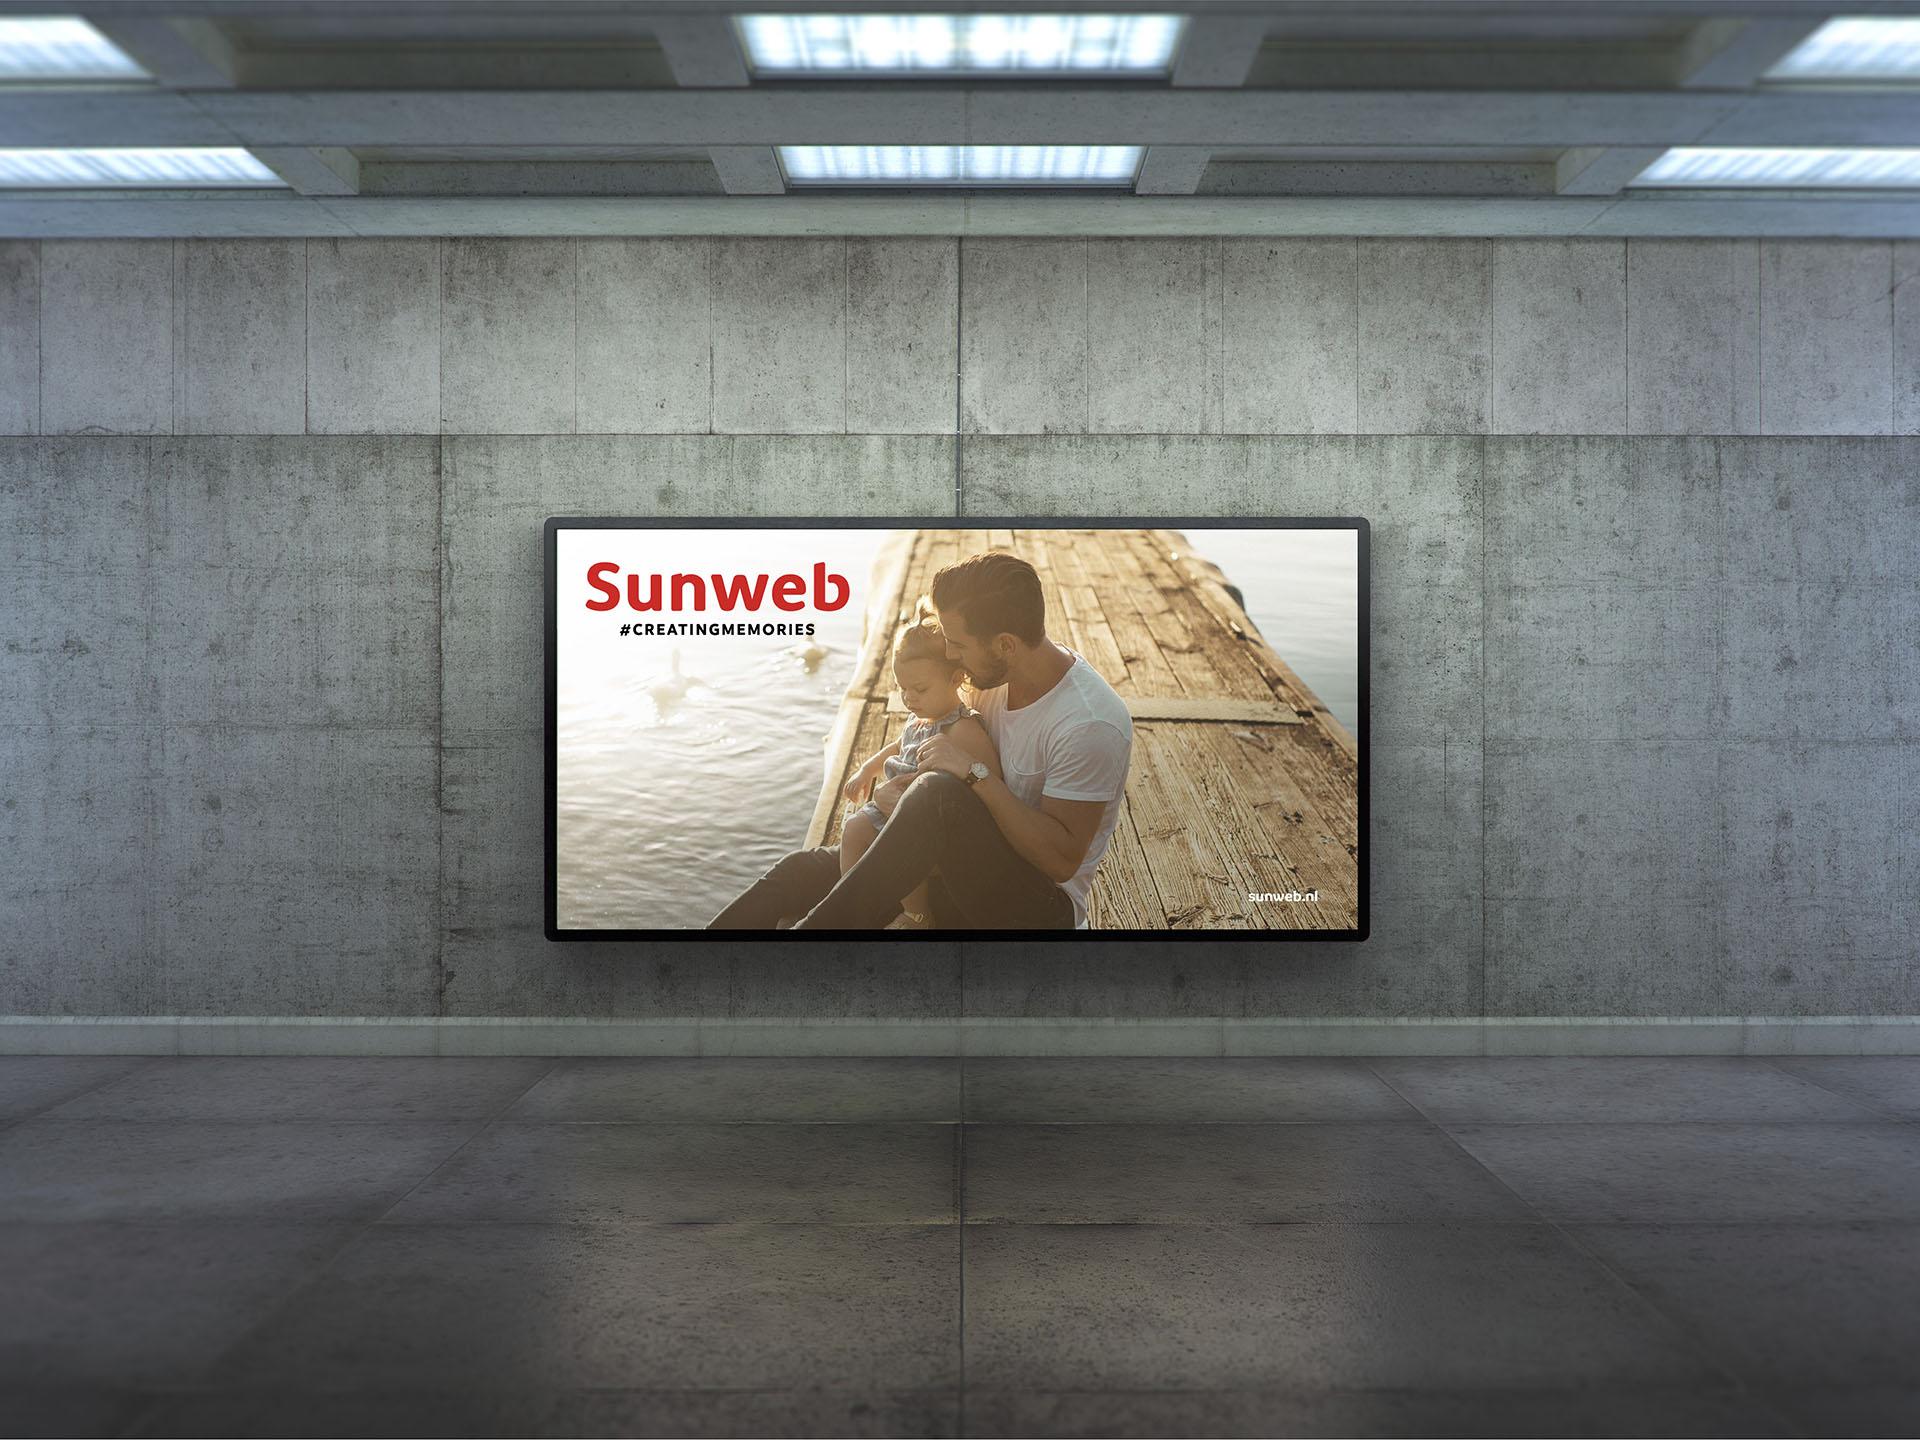 Sunweb Billboard